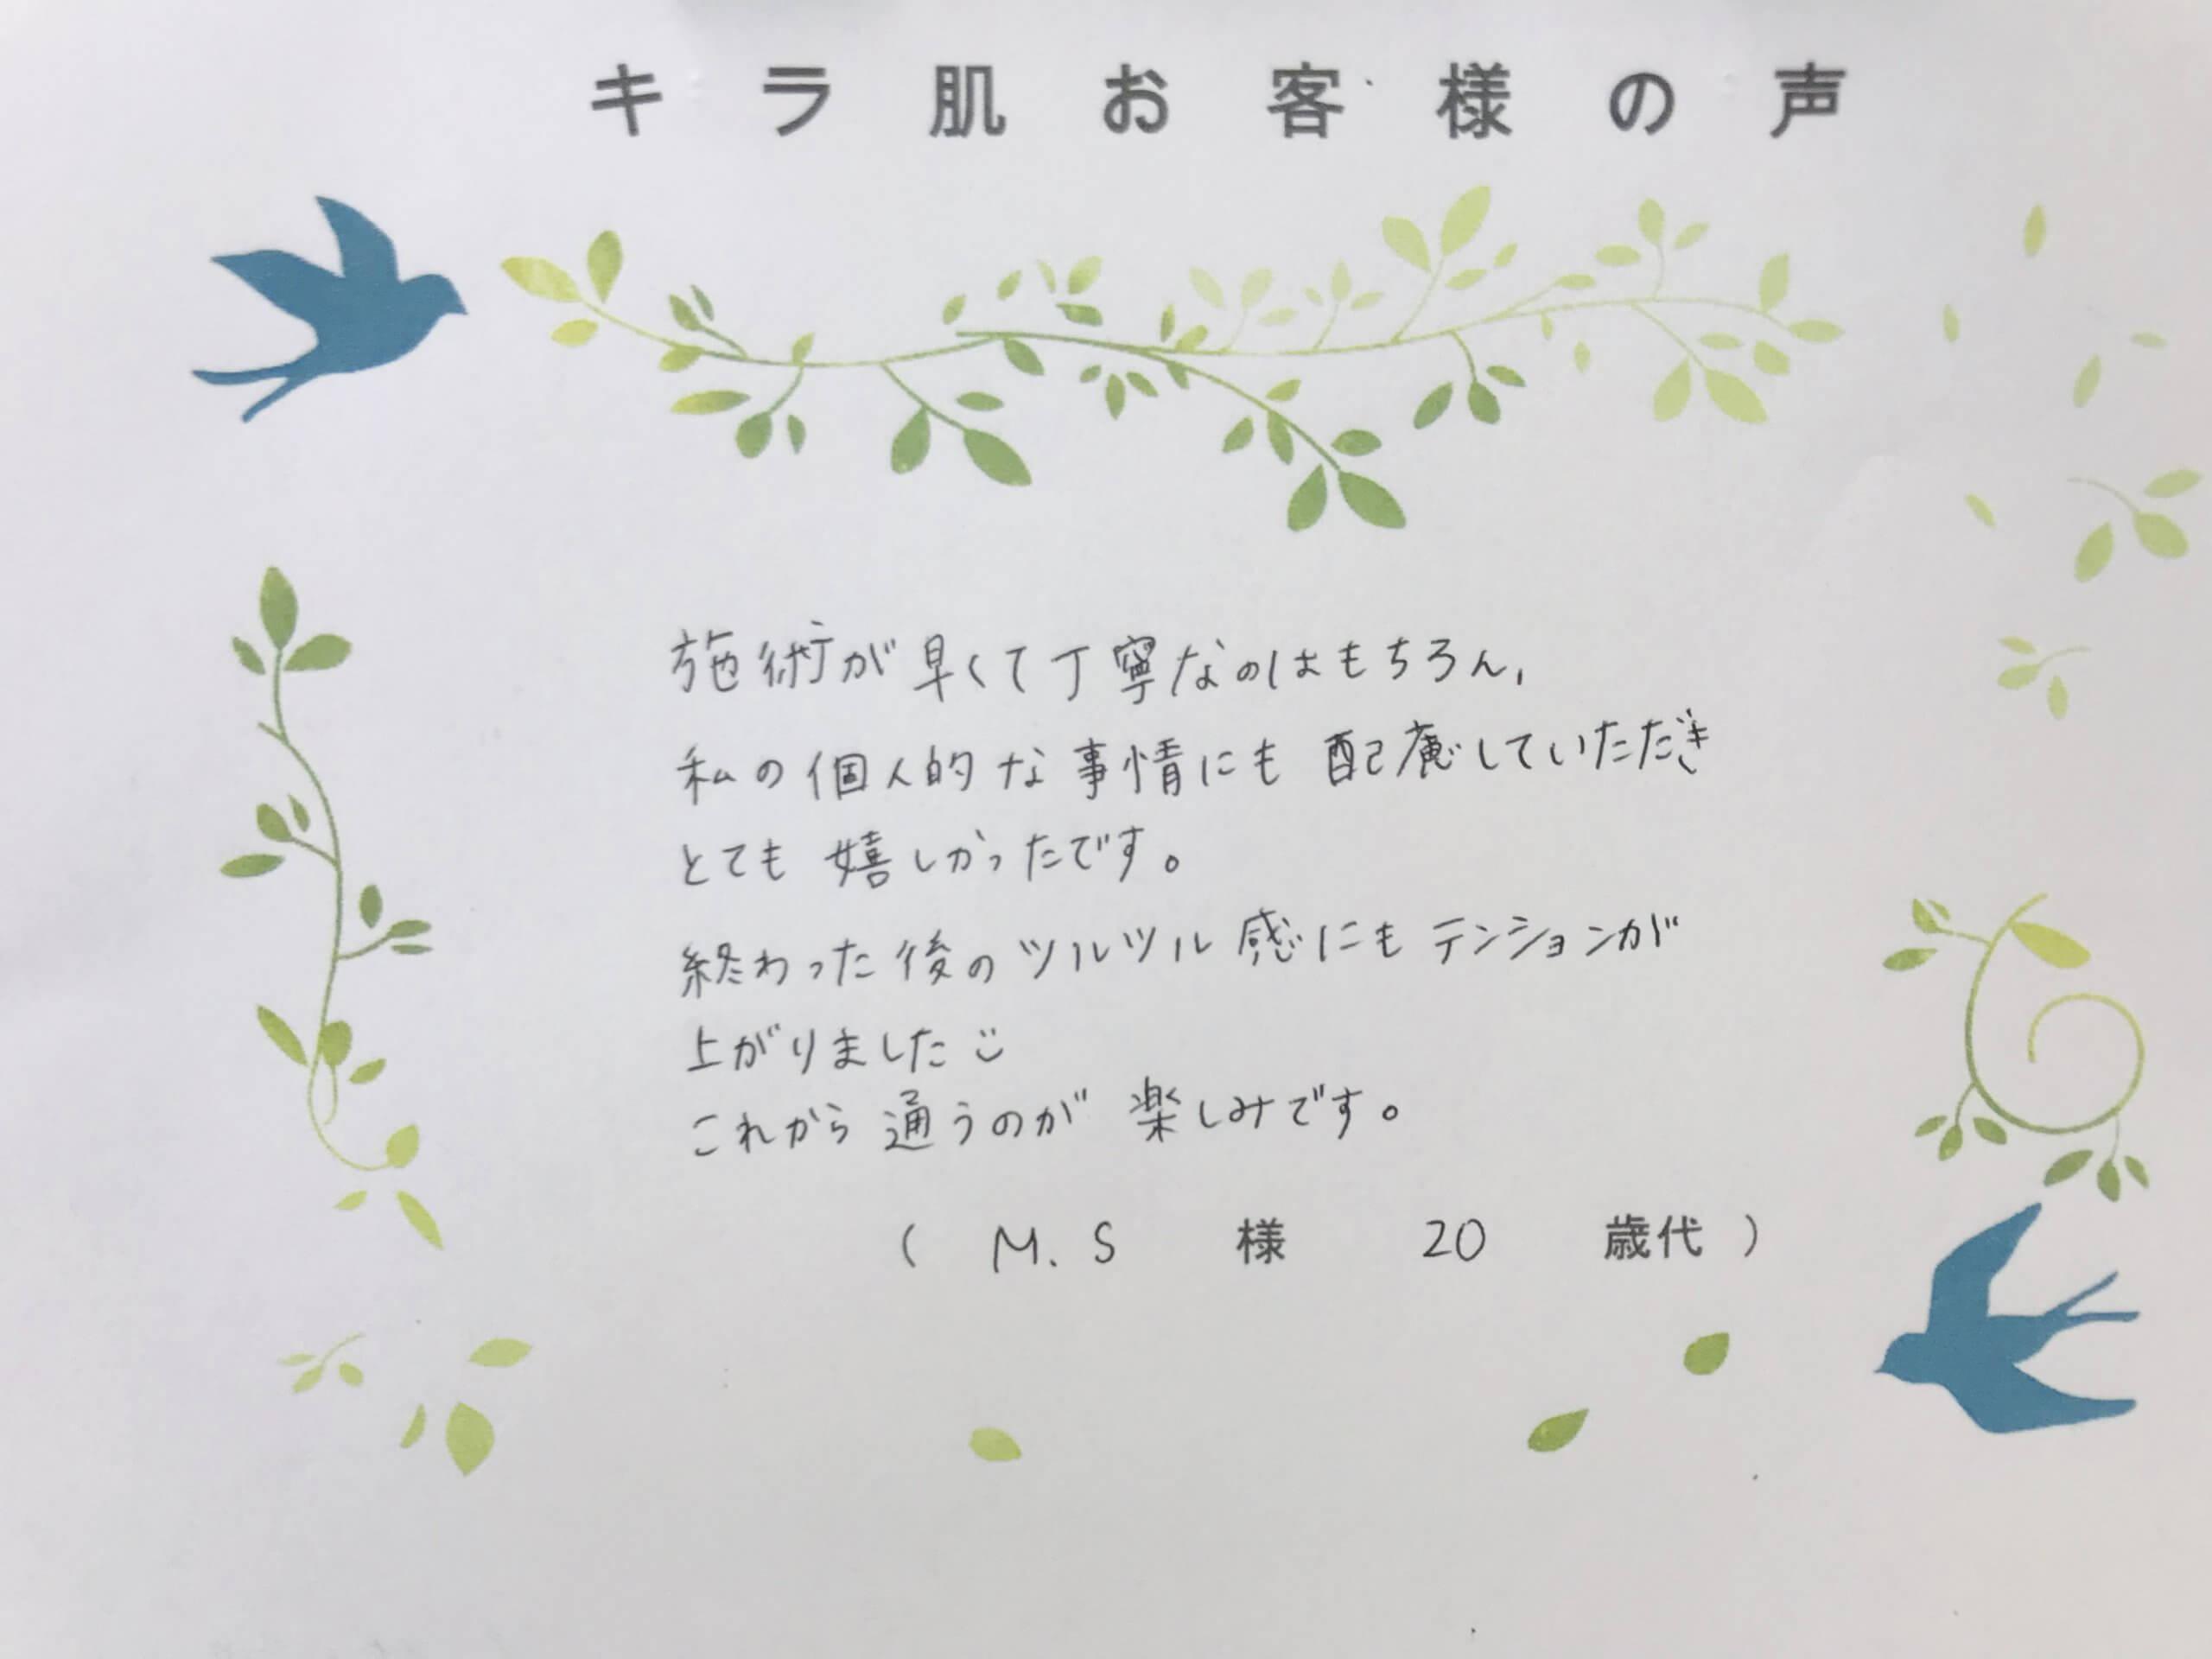 JR【松江駅】付近在住20代N.S様全身脱毛初回